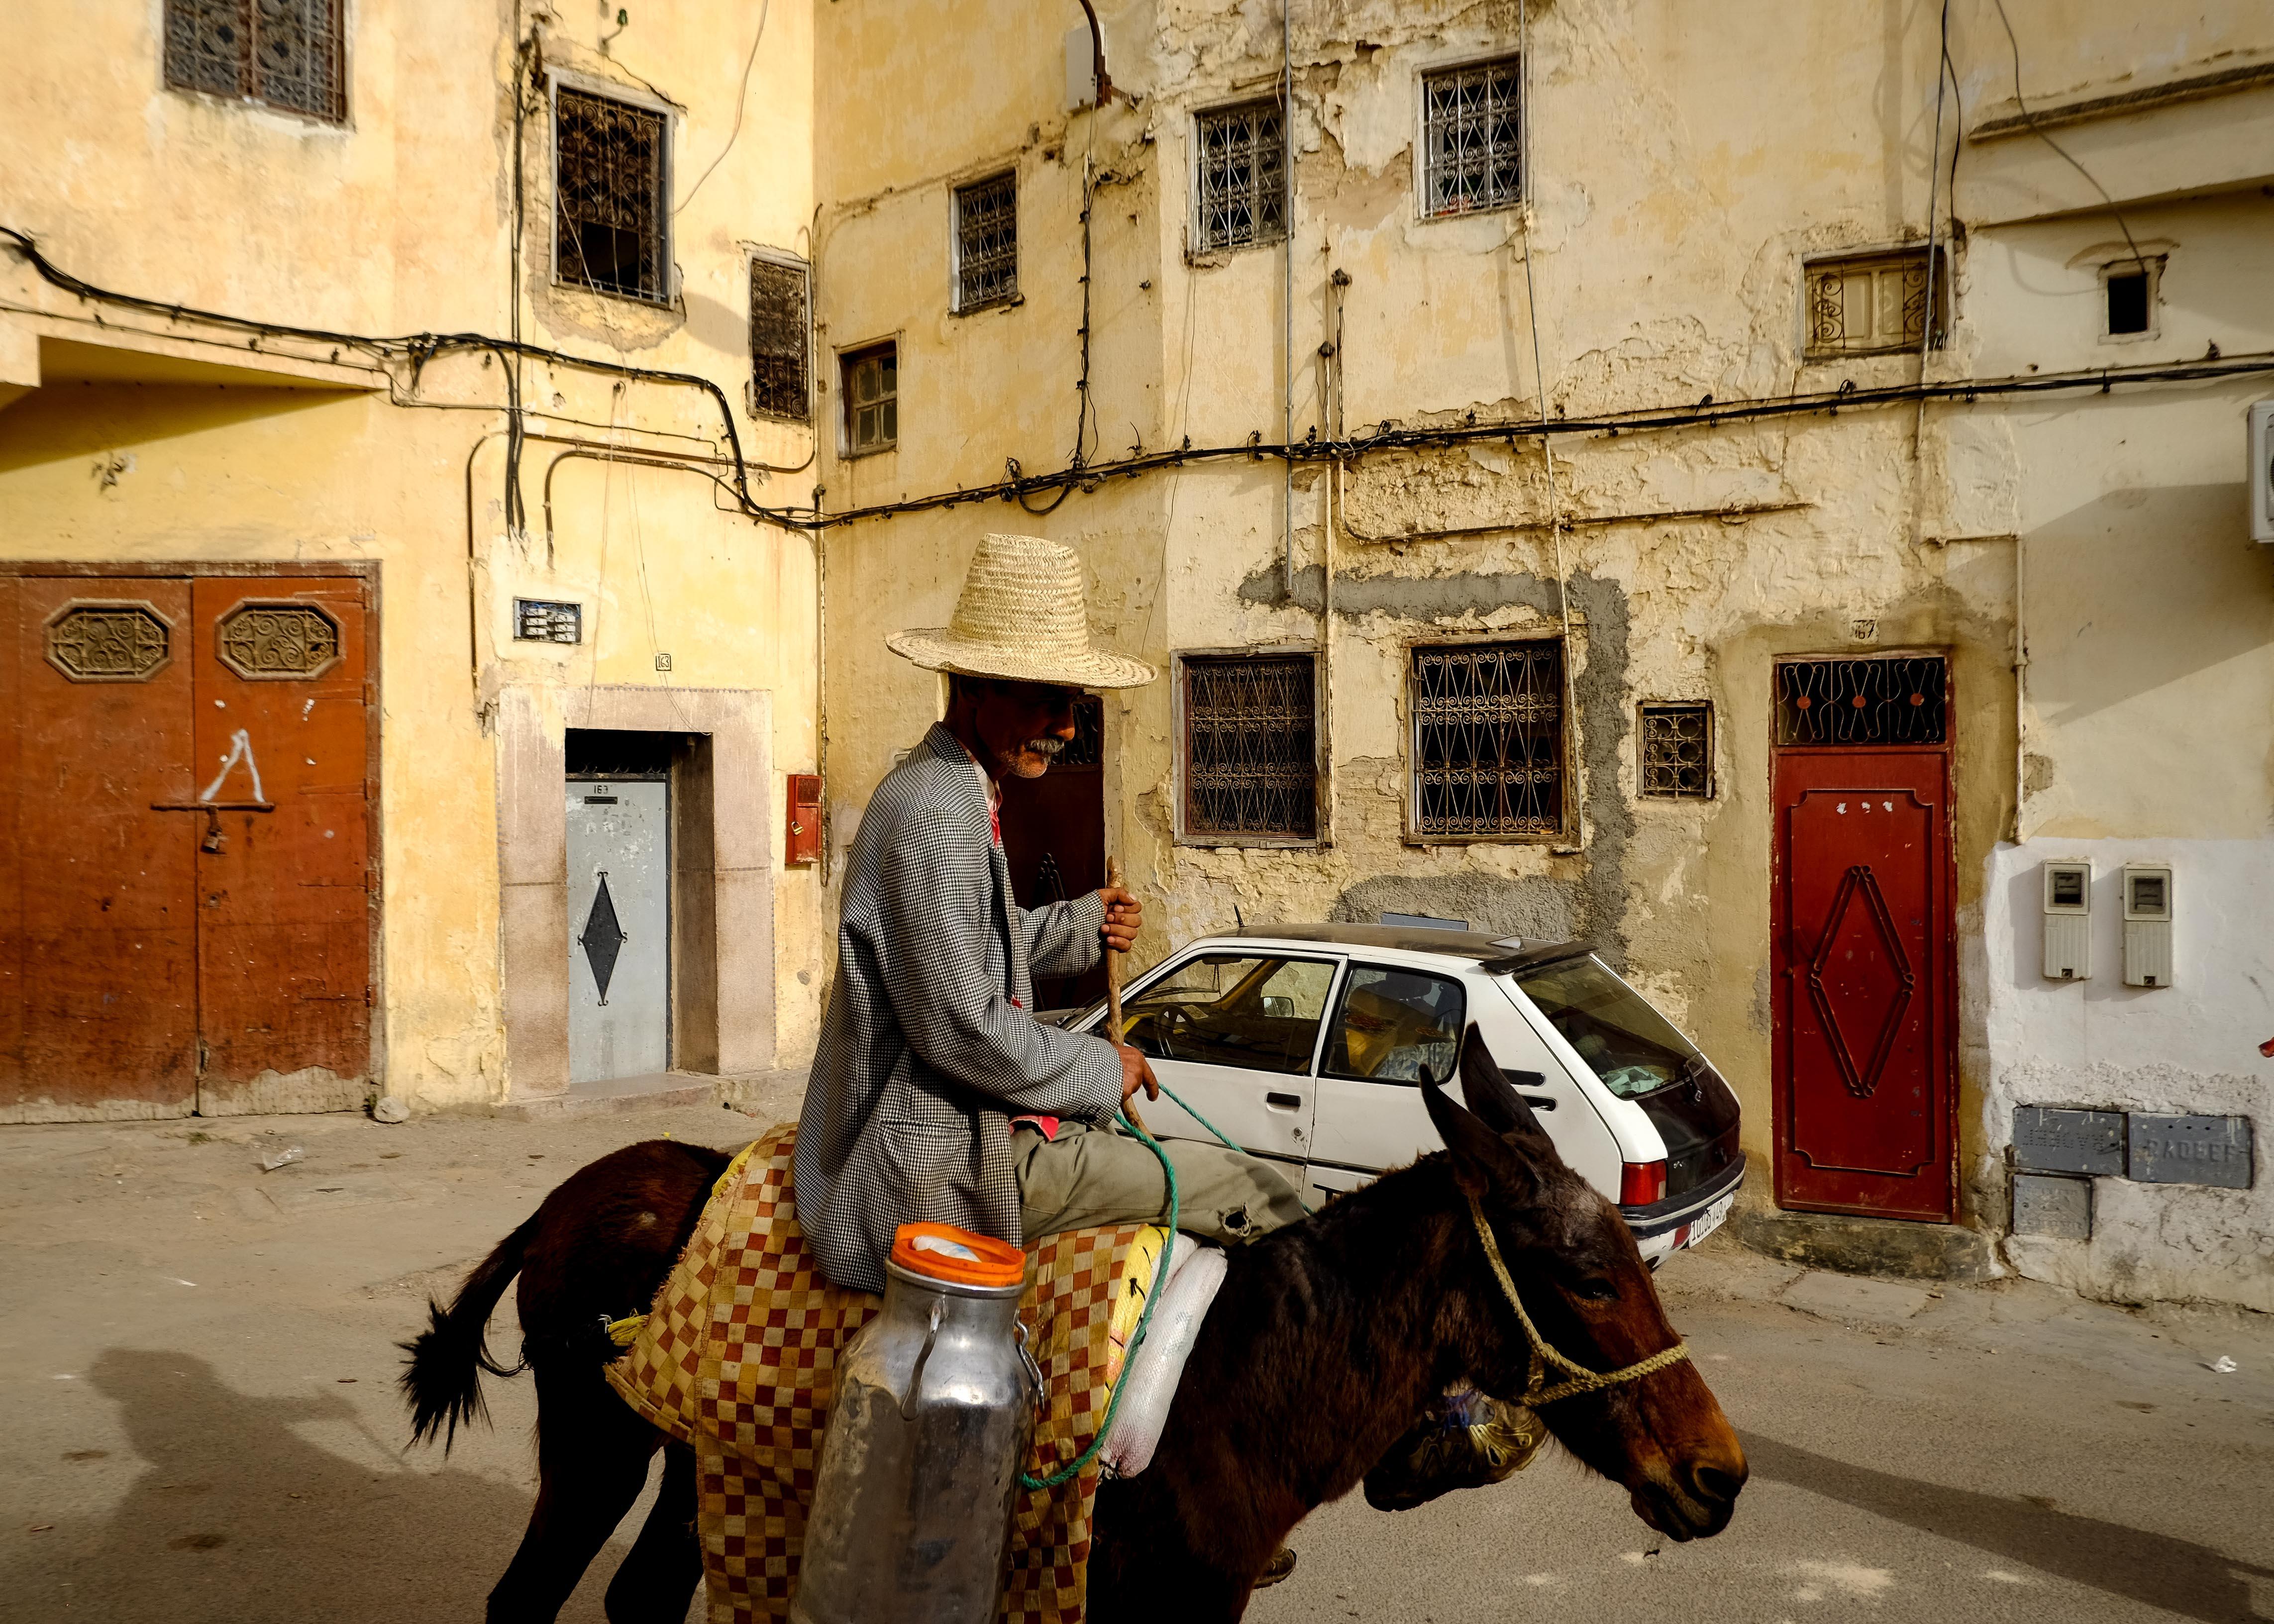 Maroc (19 of 20)